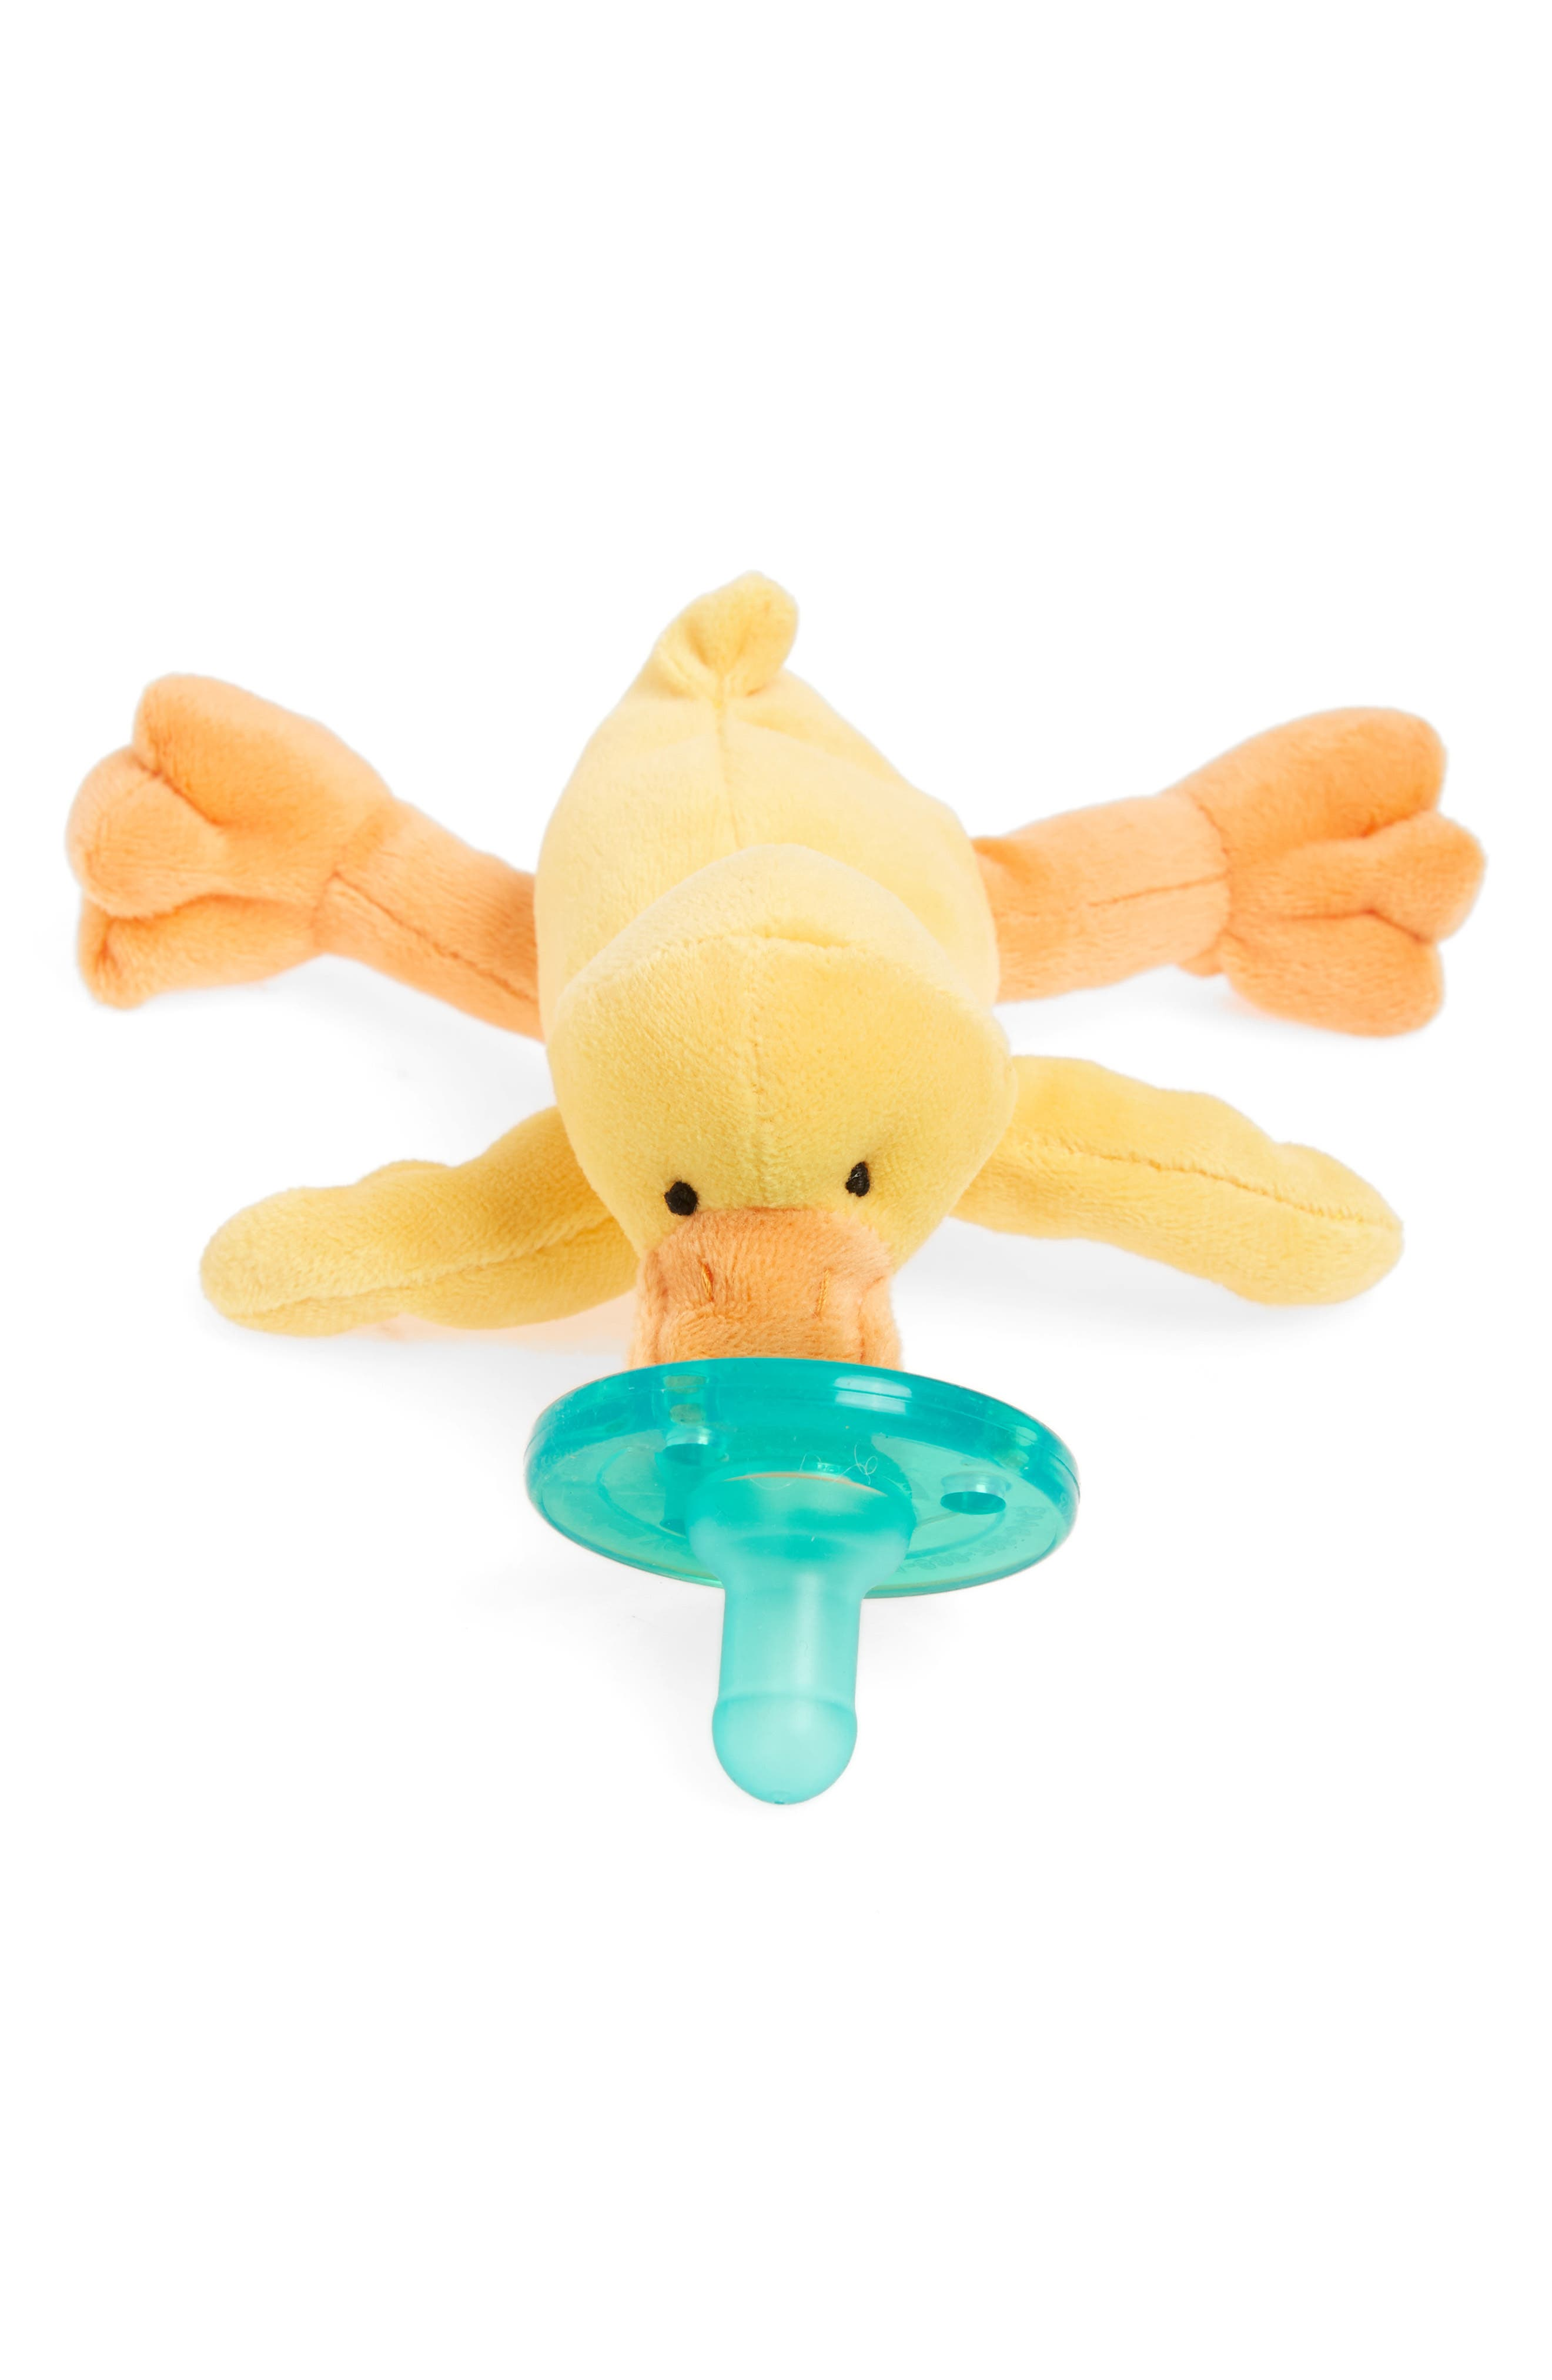 Main Image - WubbaNub™ Baby Yellow Duck Pacifier Toy